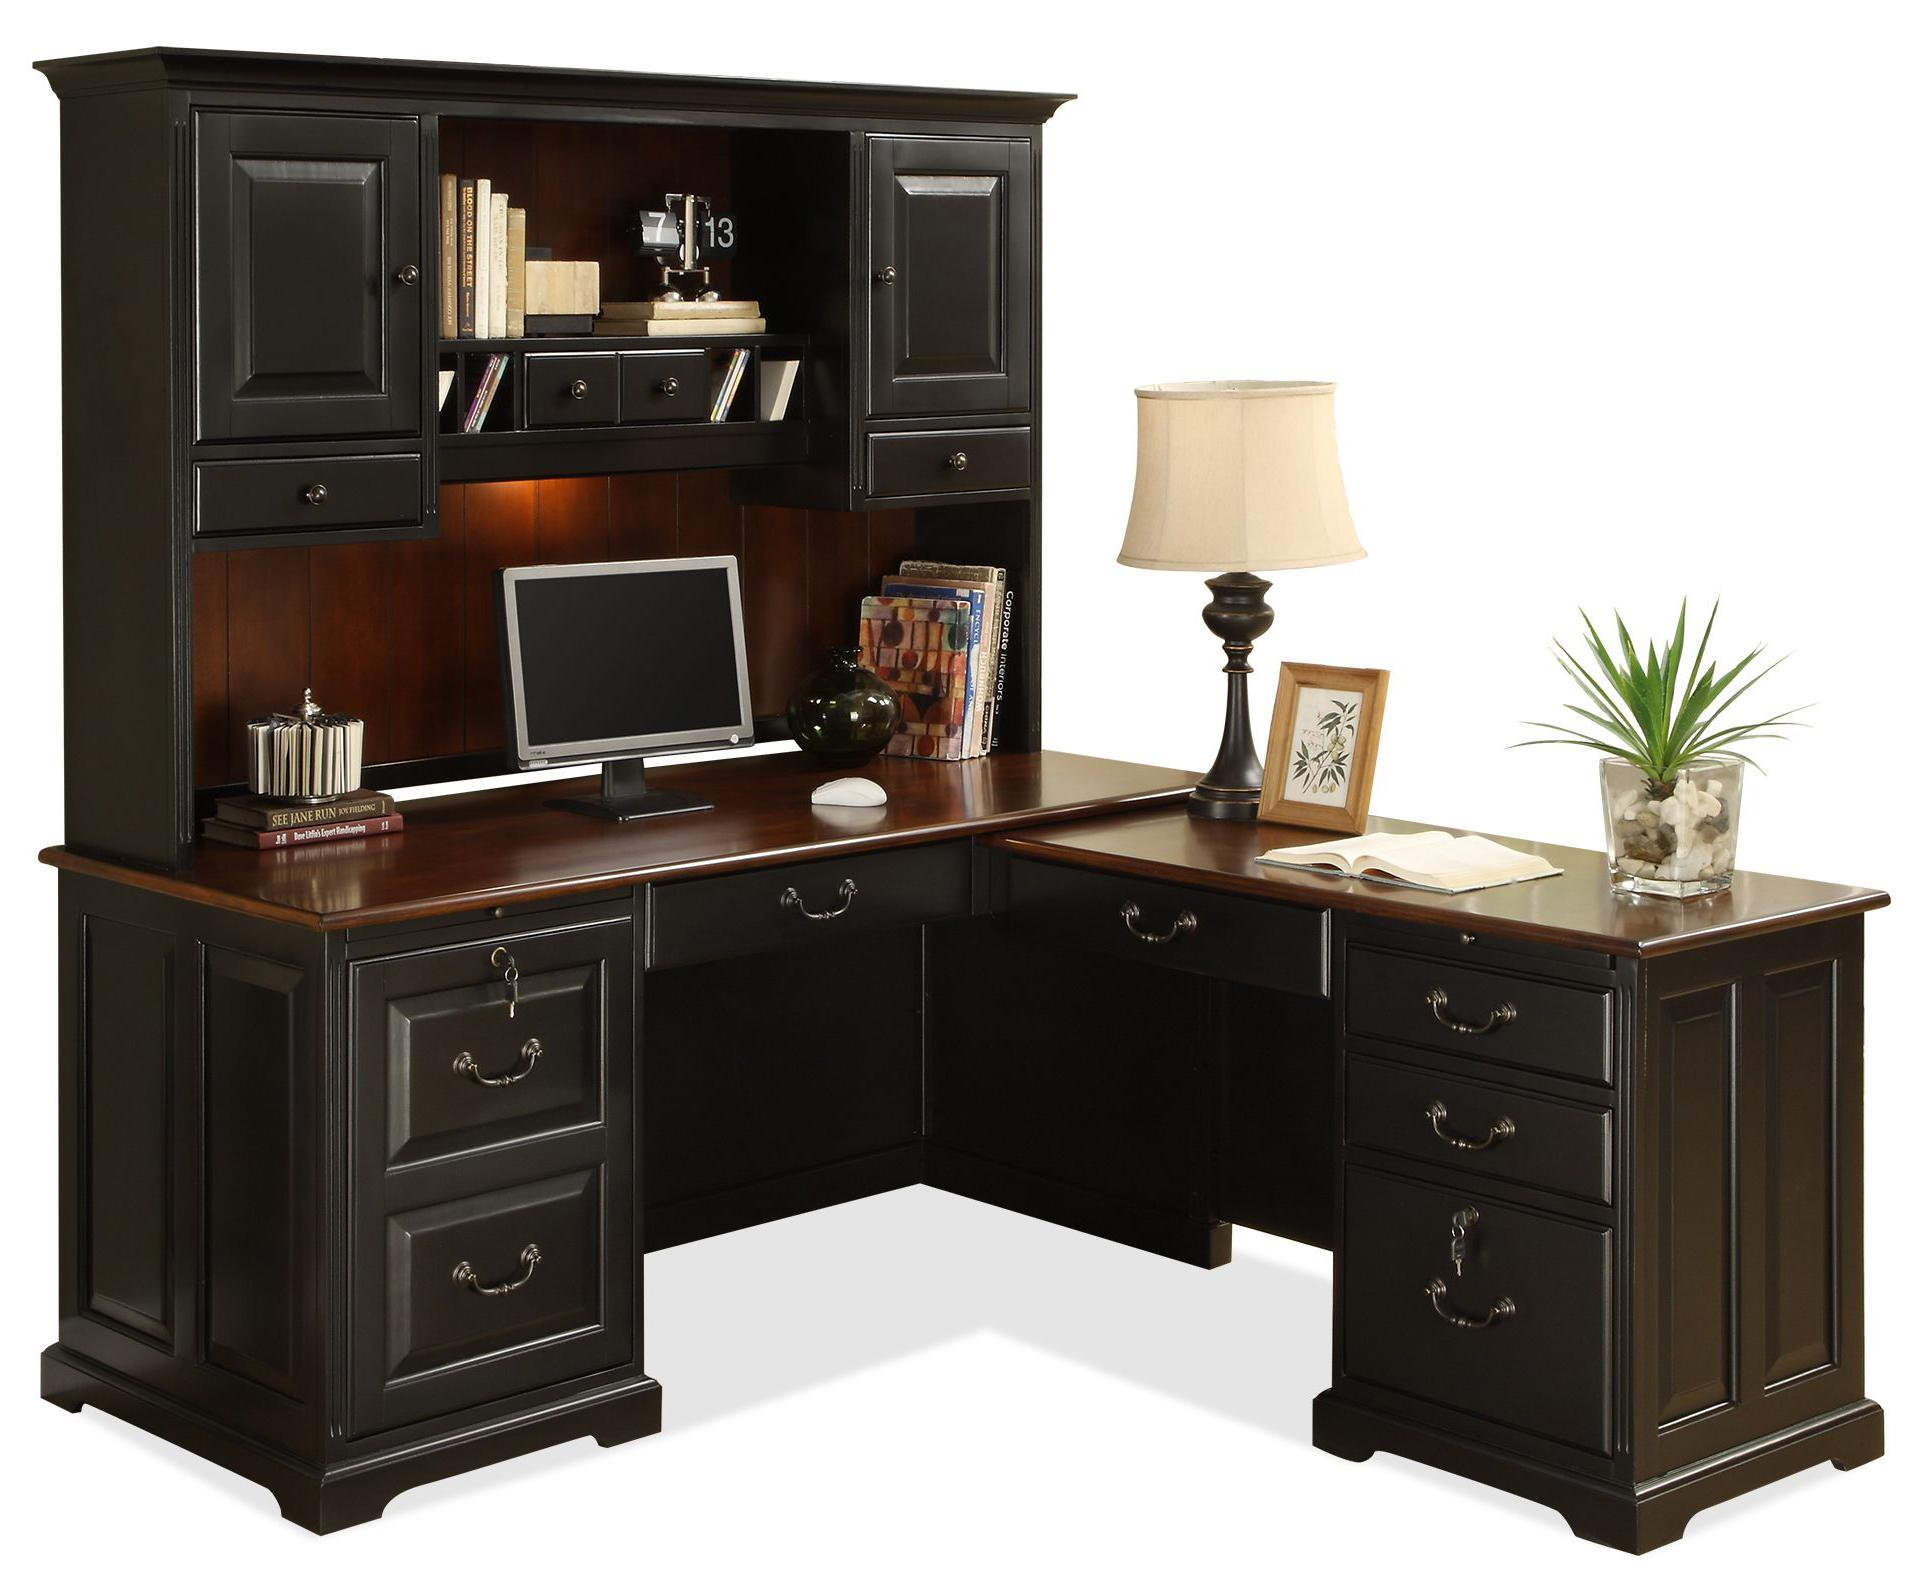 L Shape puter Workstation Desk with Hutch by Riverside